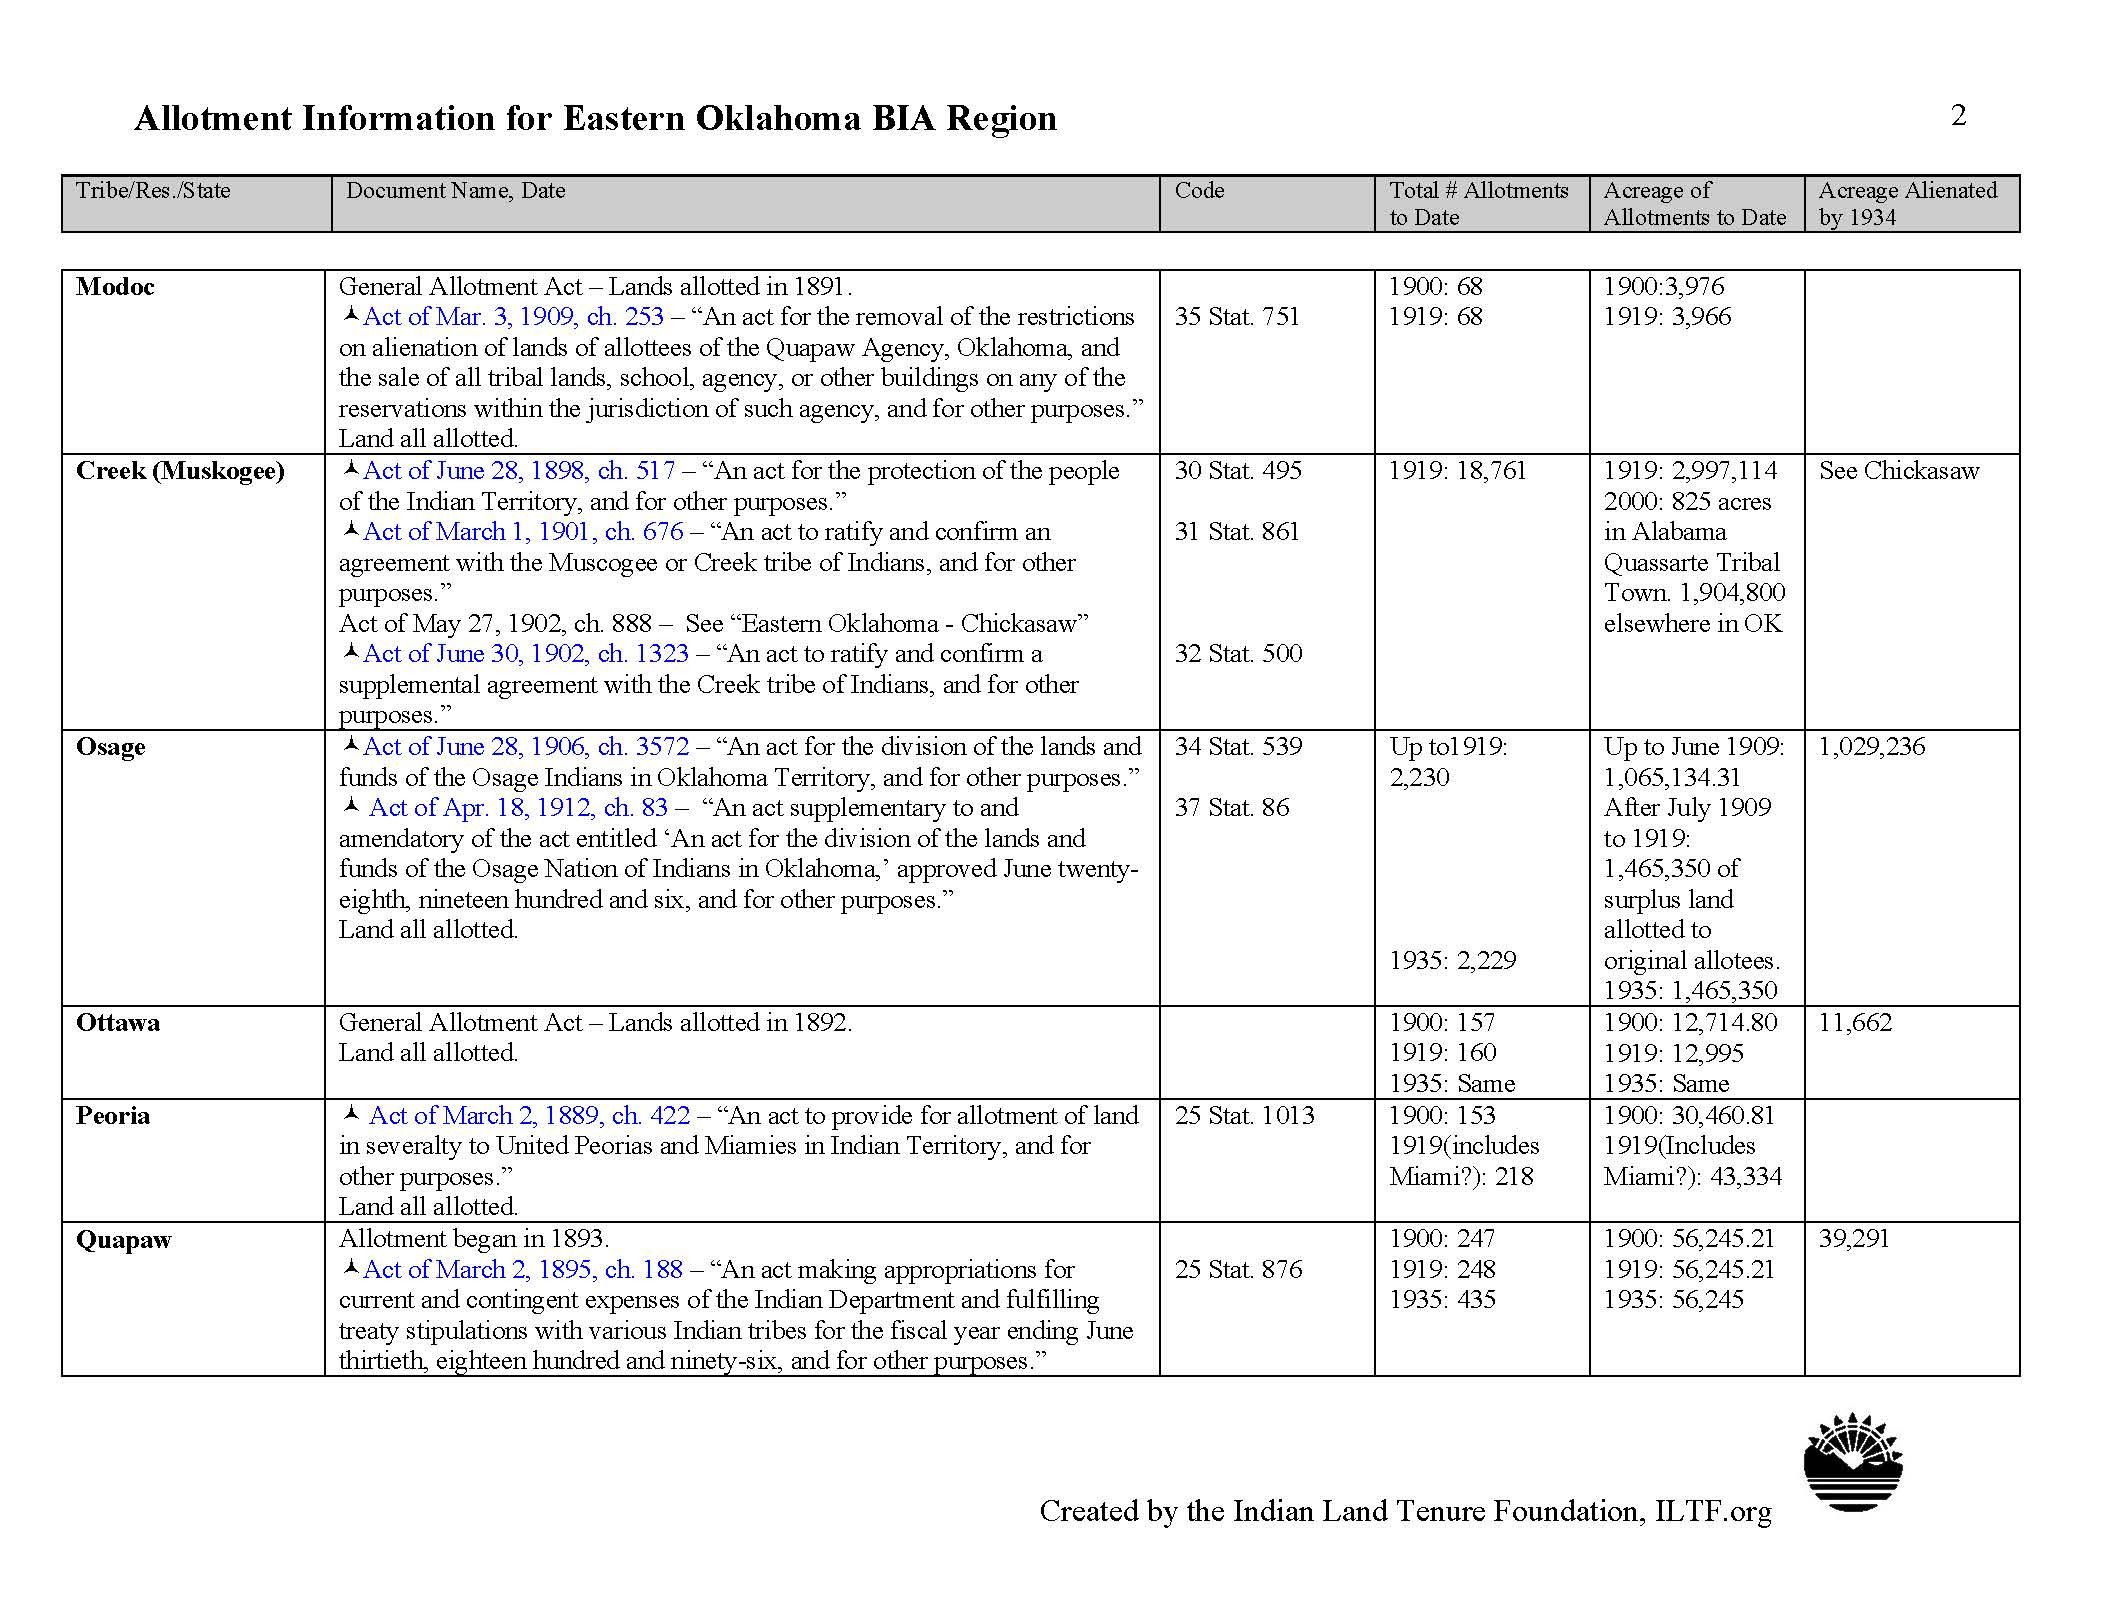 eastern_oklahoma_page_2